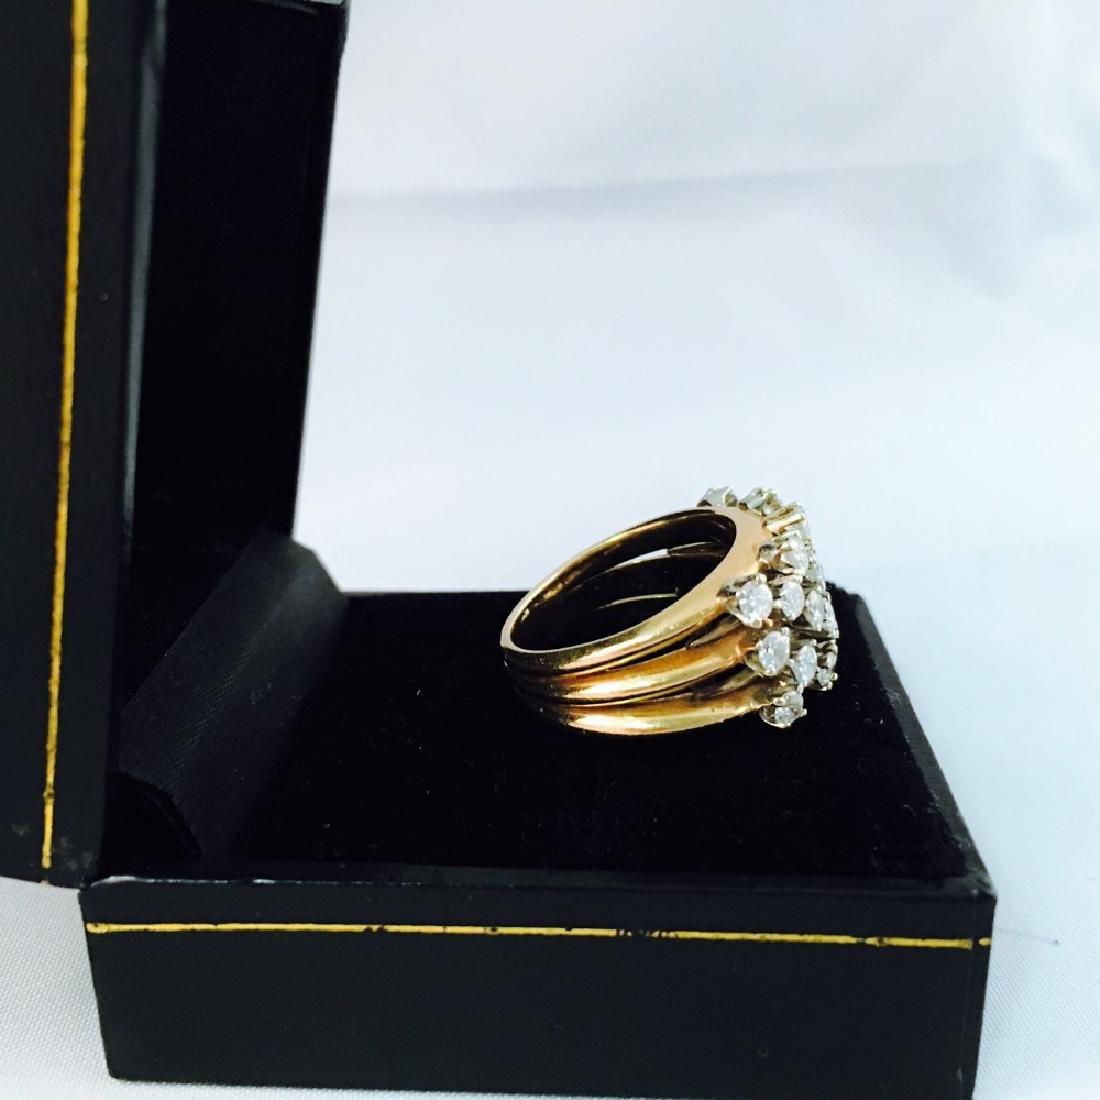 14k Gold, White Diamond Cocktail Ring - 3